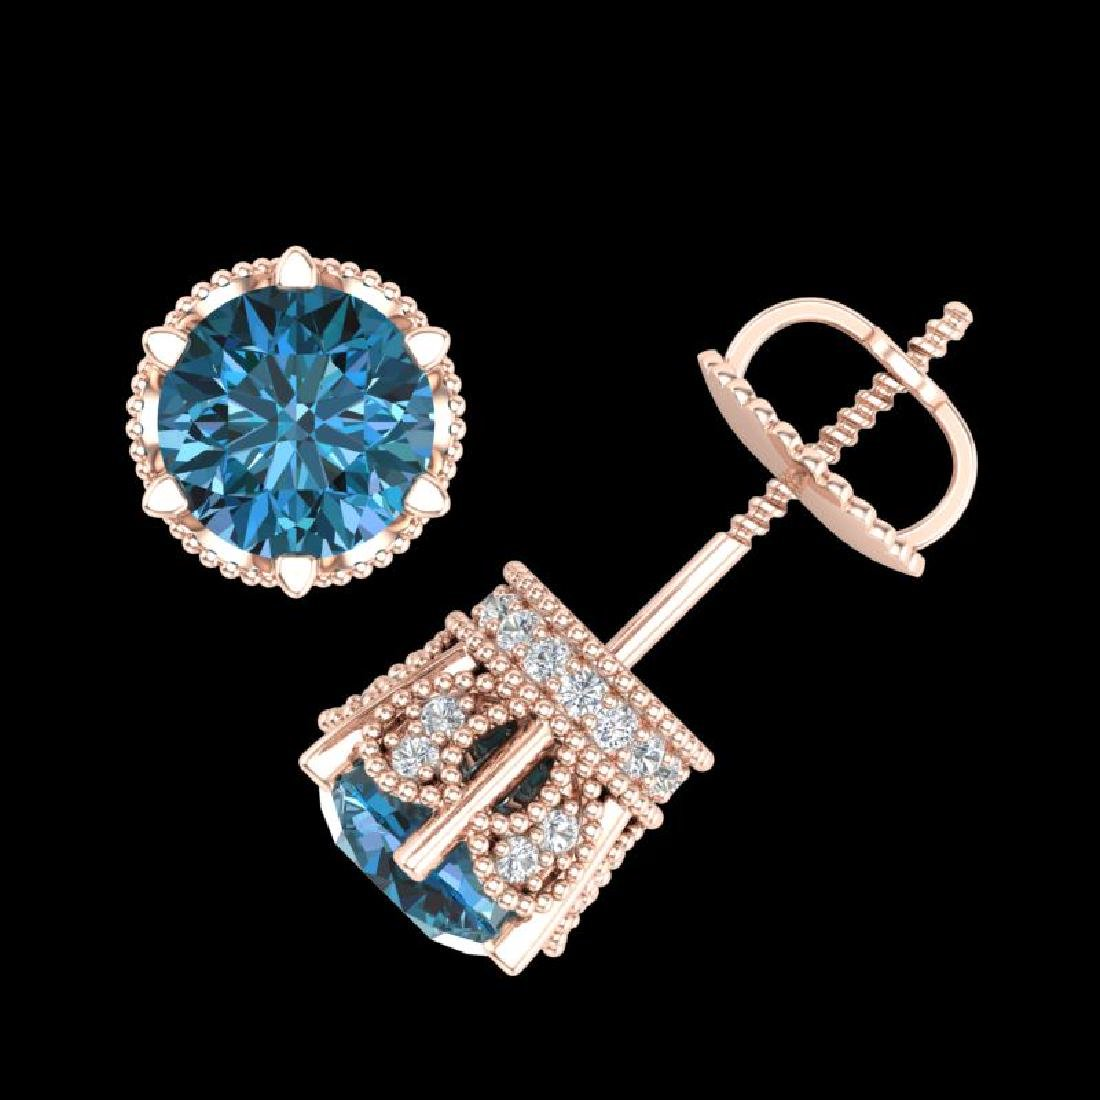 2.04 CTW Fancy Intense Blue Diamond Art Deco Stud - 3